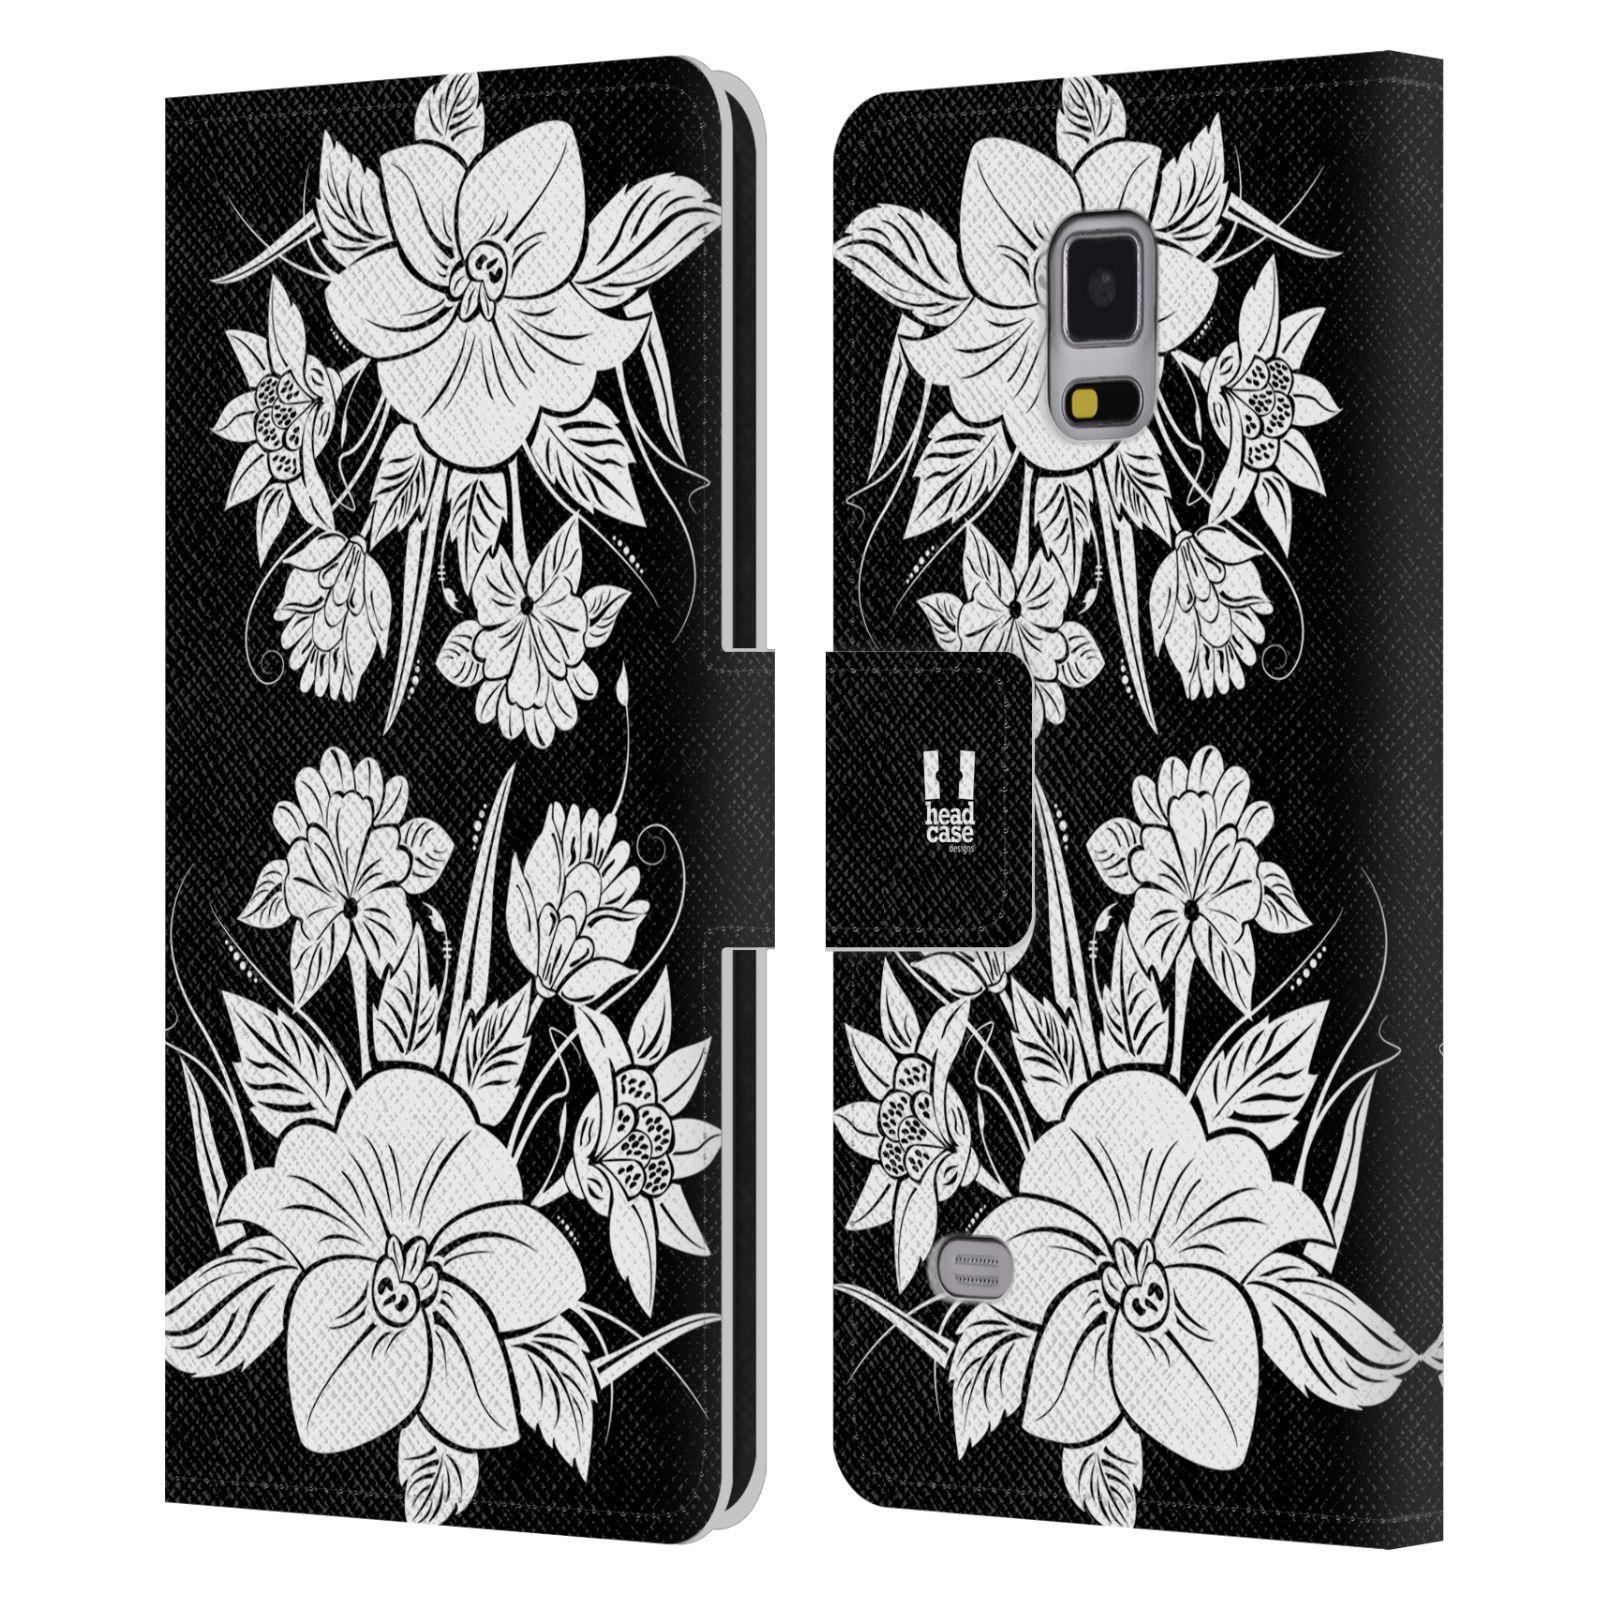 HEAD CASE Flipové pouzdro pro mobil Samsung Galaxy Note 4 ČERNOBÍLÁ KVĚTINA pohádková zahrada